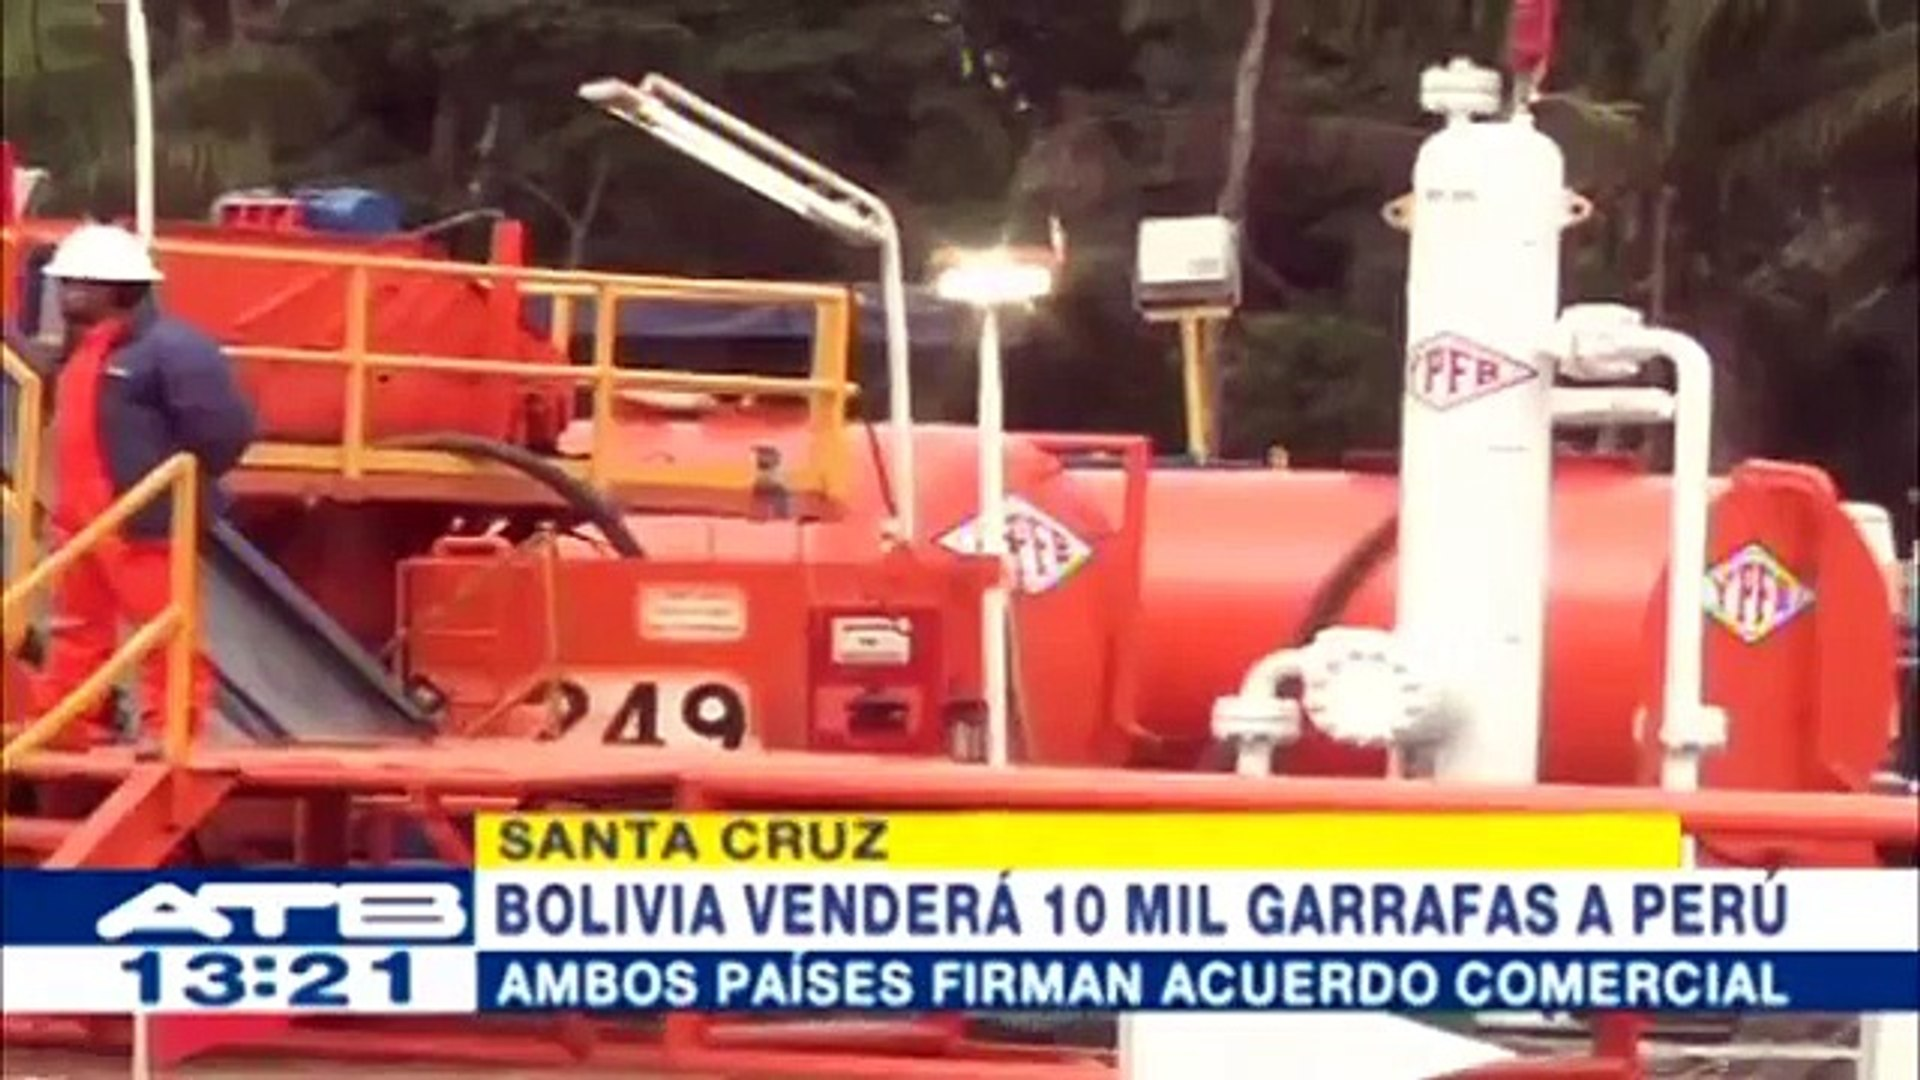 Bolivia venderá 10 mil garrafas de GLP a Perú